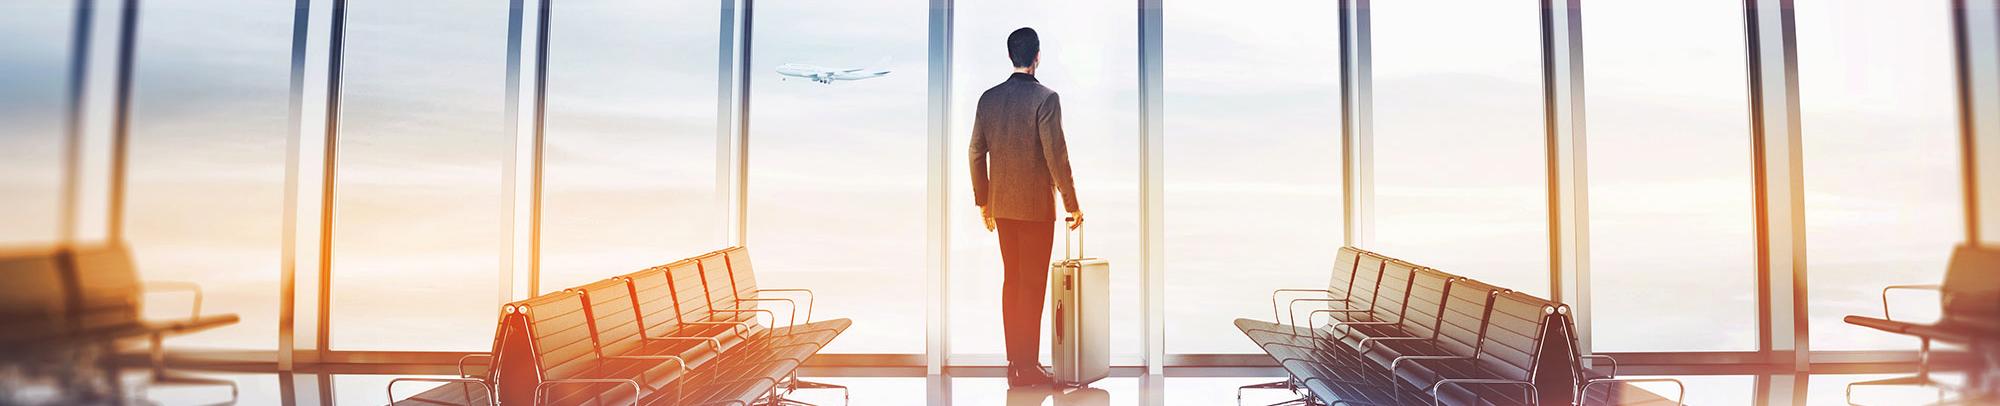 tgv-airport-lounge-terminal